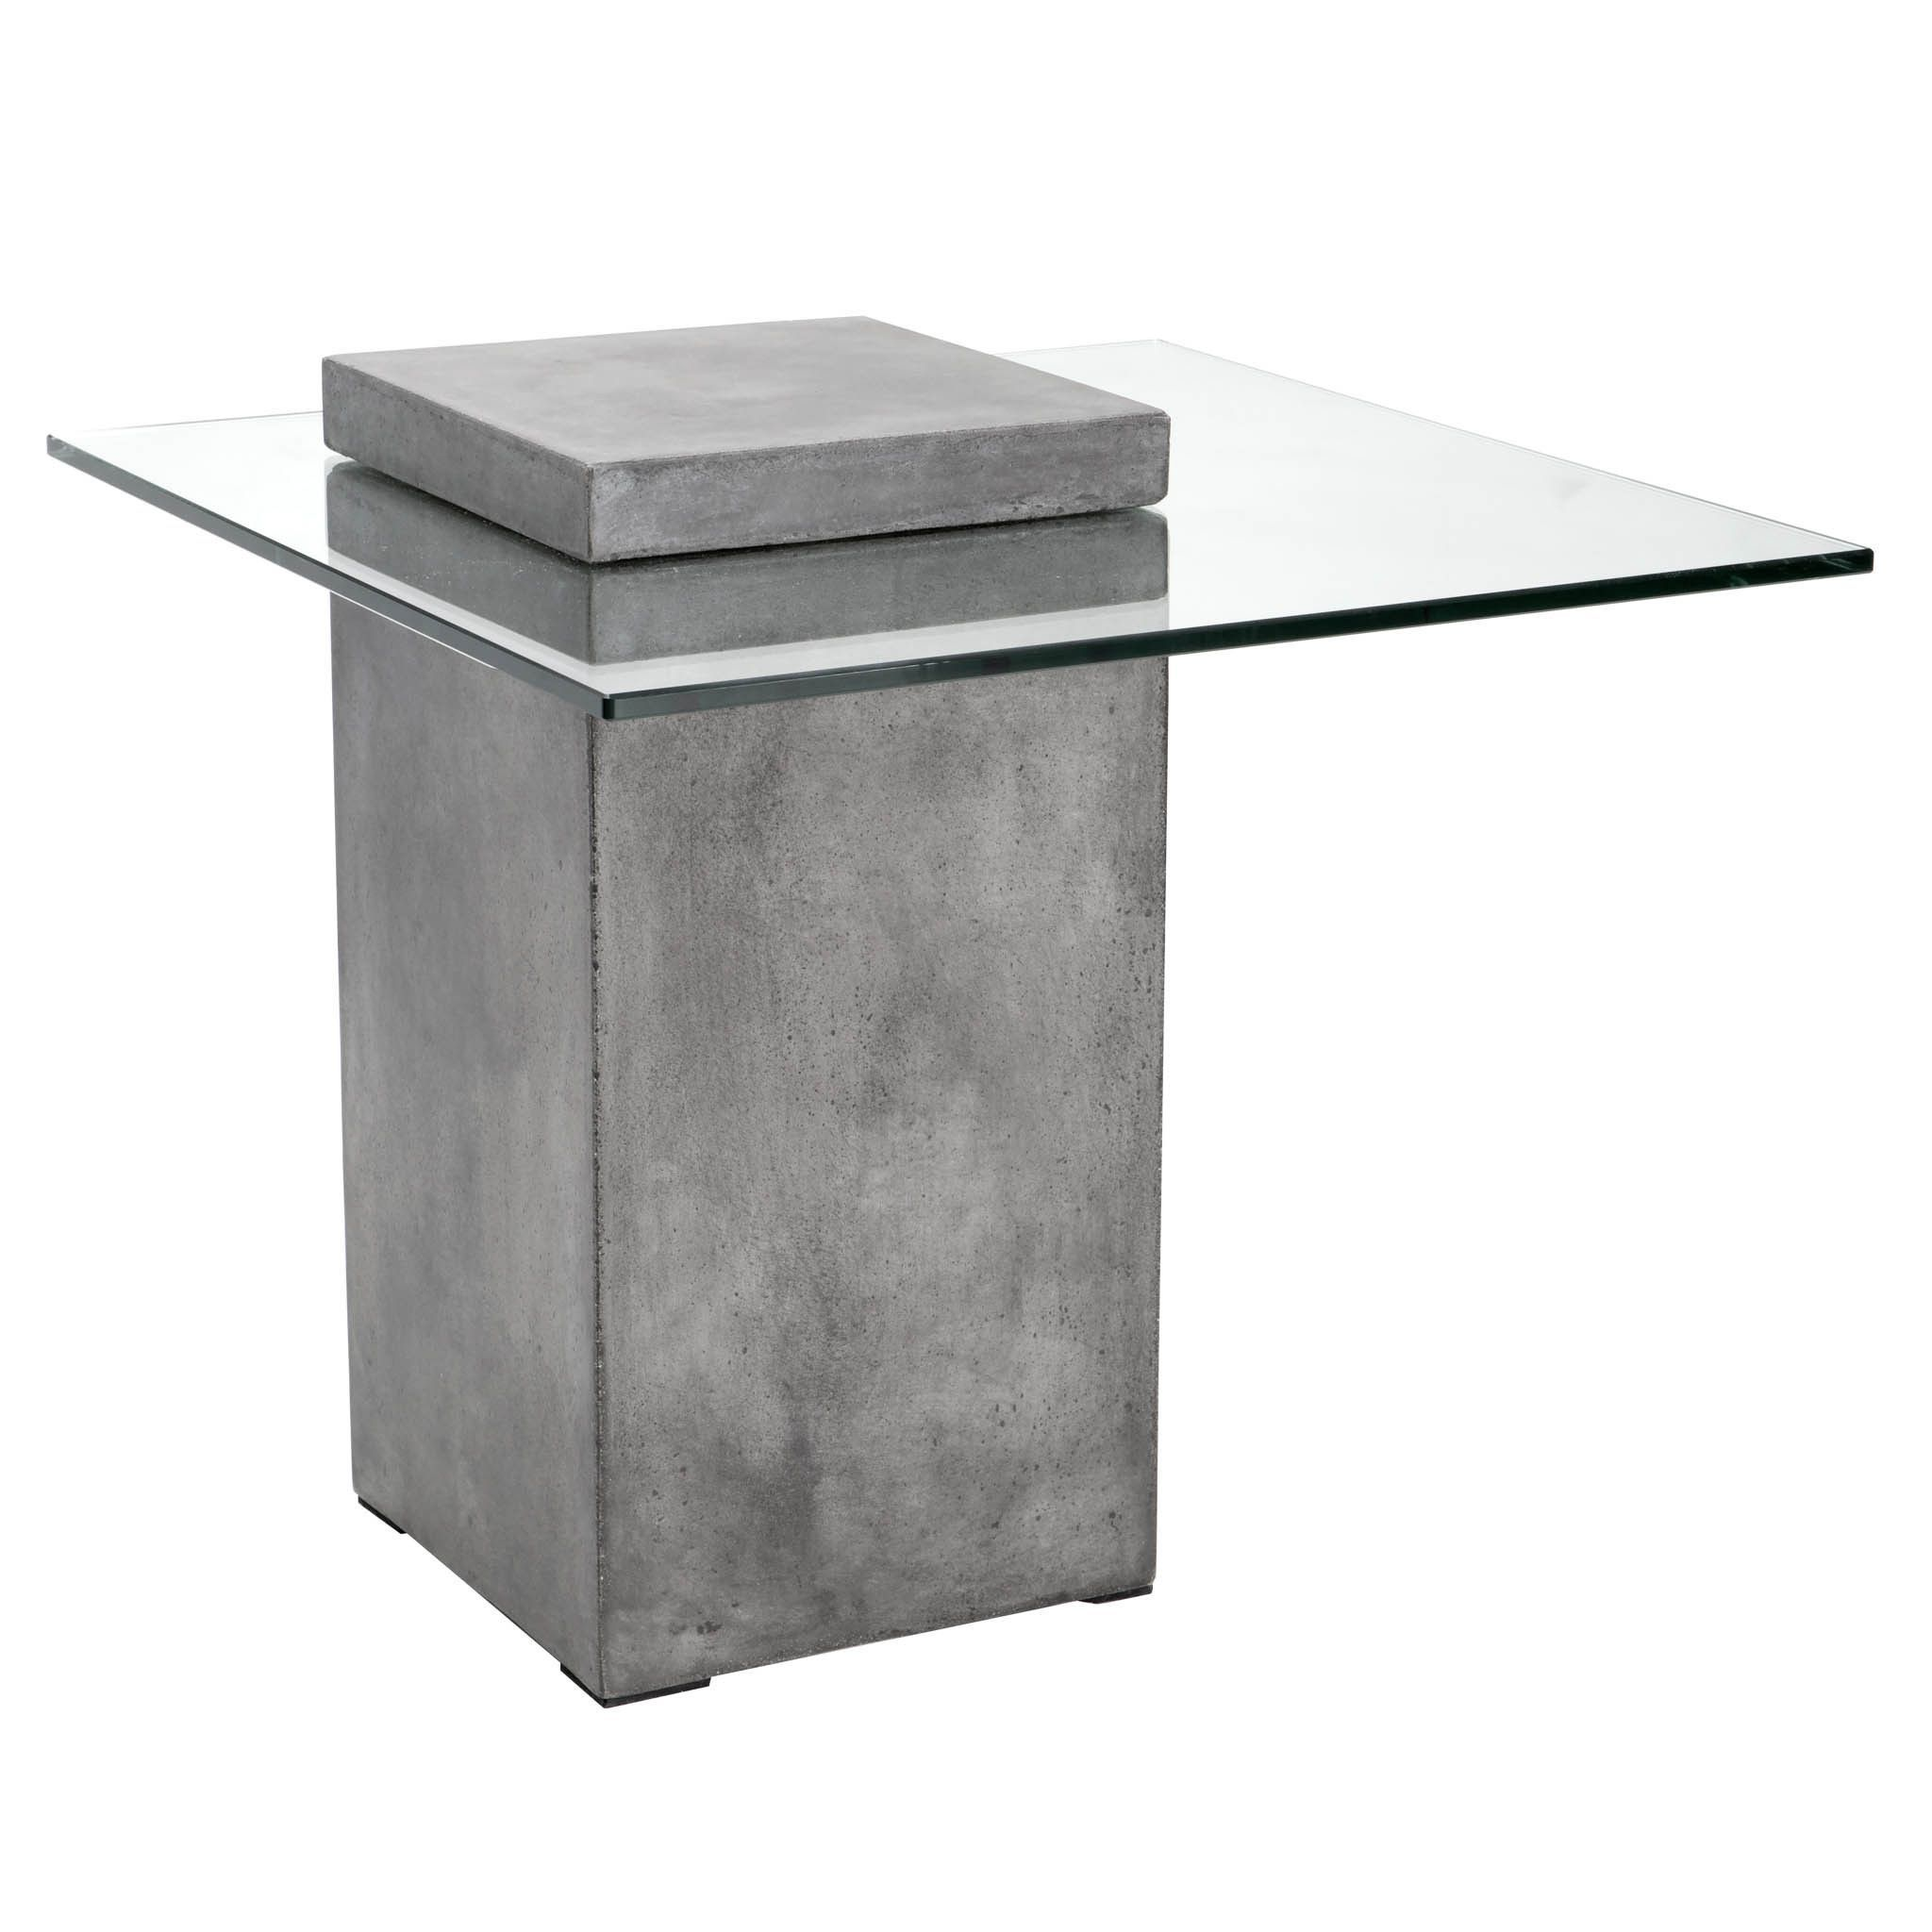 Sunpan Mixt Grange Anthracite Grey Concrete Glass End Table Anthracite Grey End Tabl Muebles De Concreto Madera Con Concreto Diseno De Interiores Industrial [ 2048 x 2048 Pixel ]